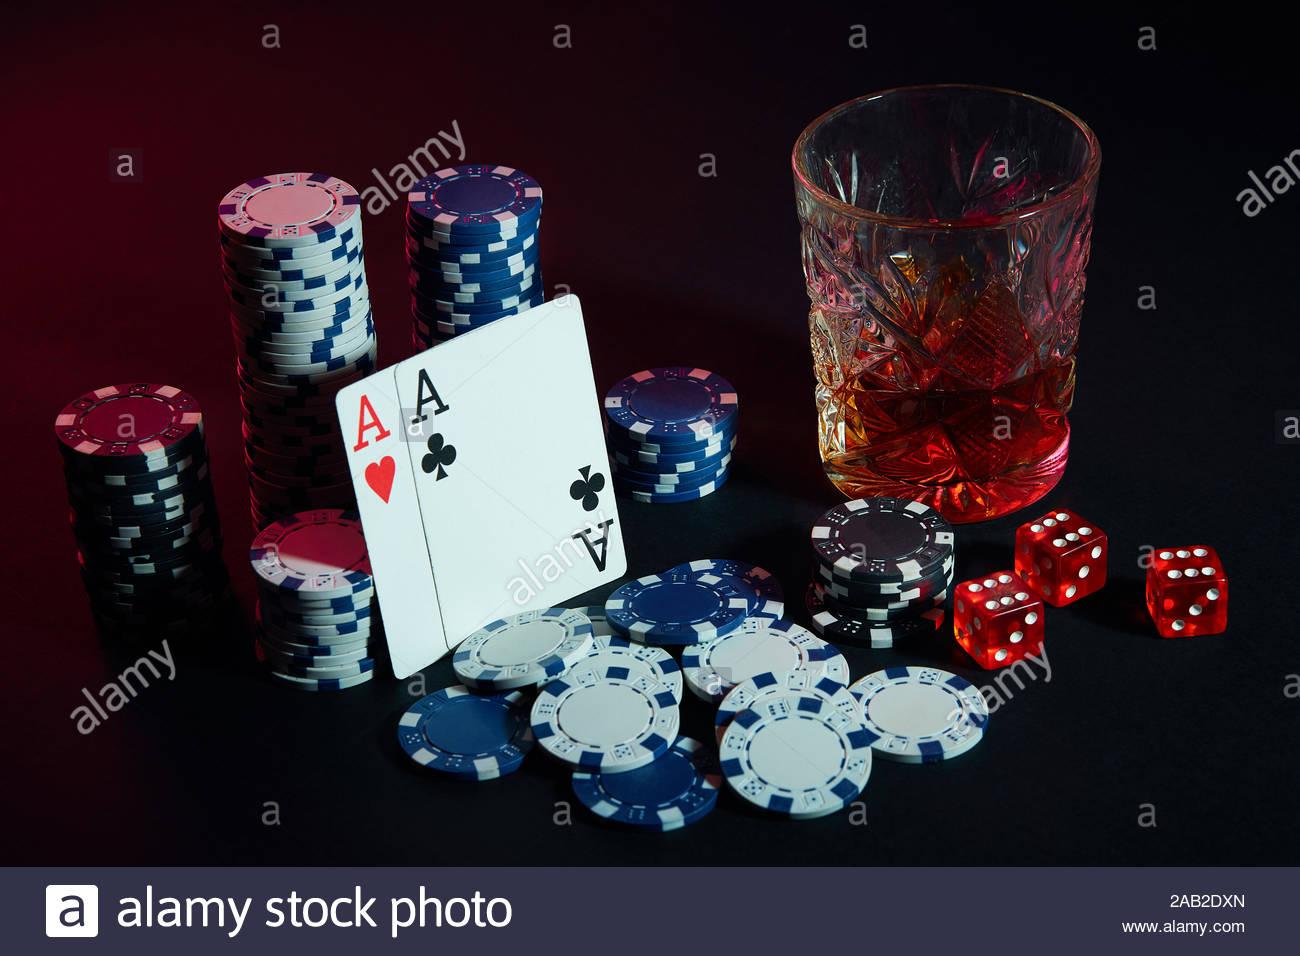 Gambling Reviews & Information